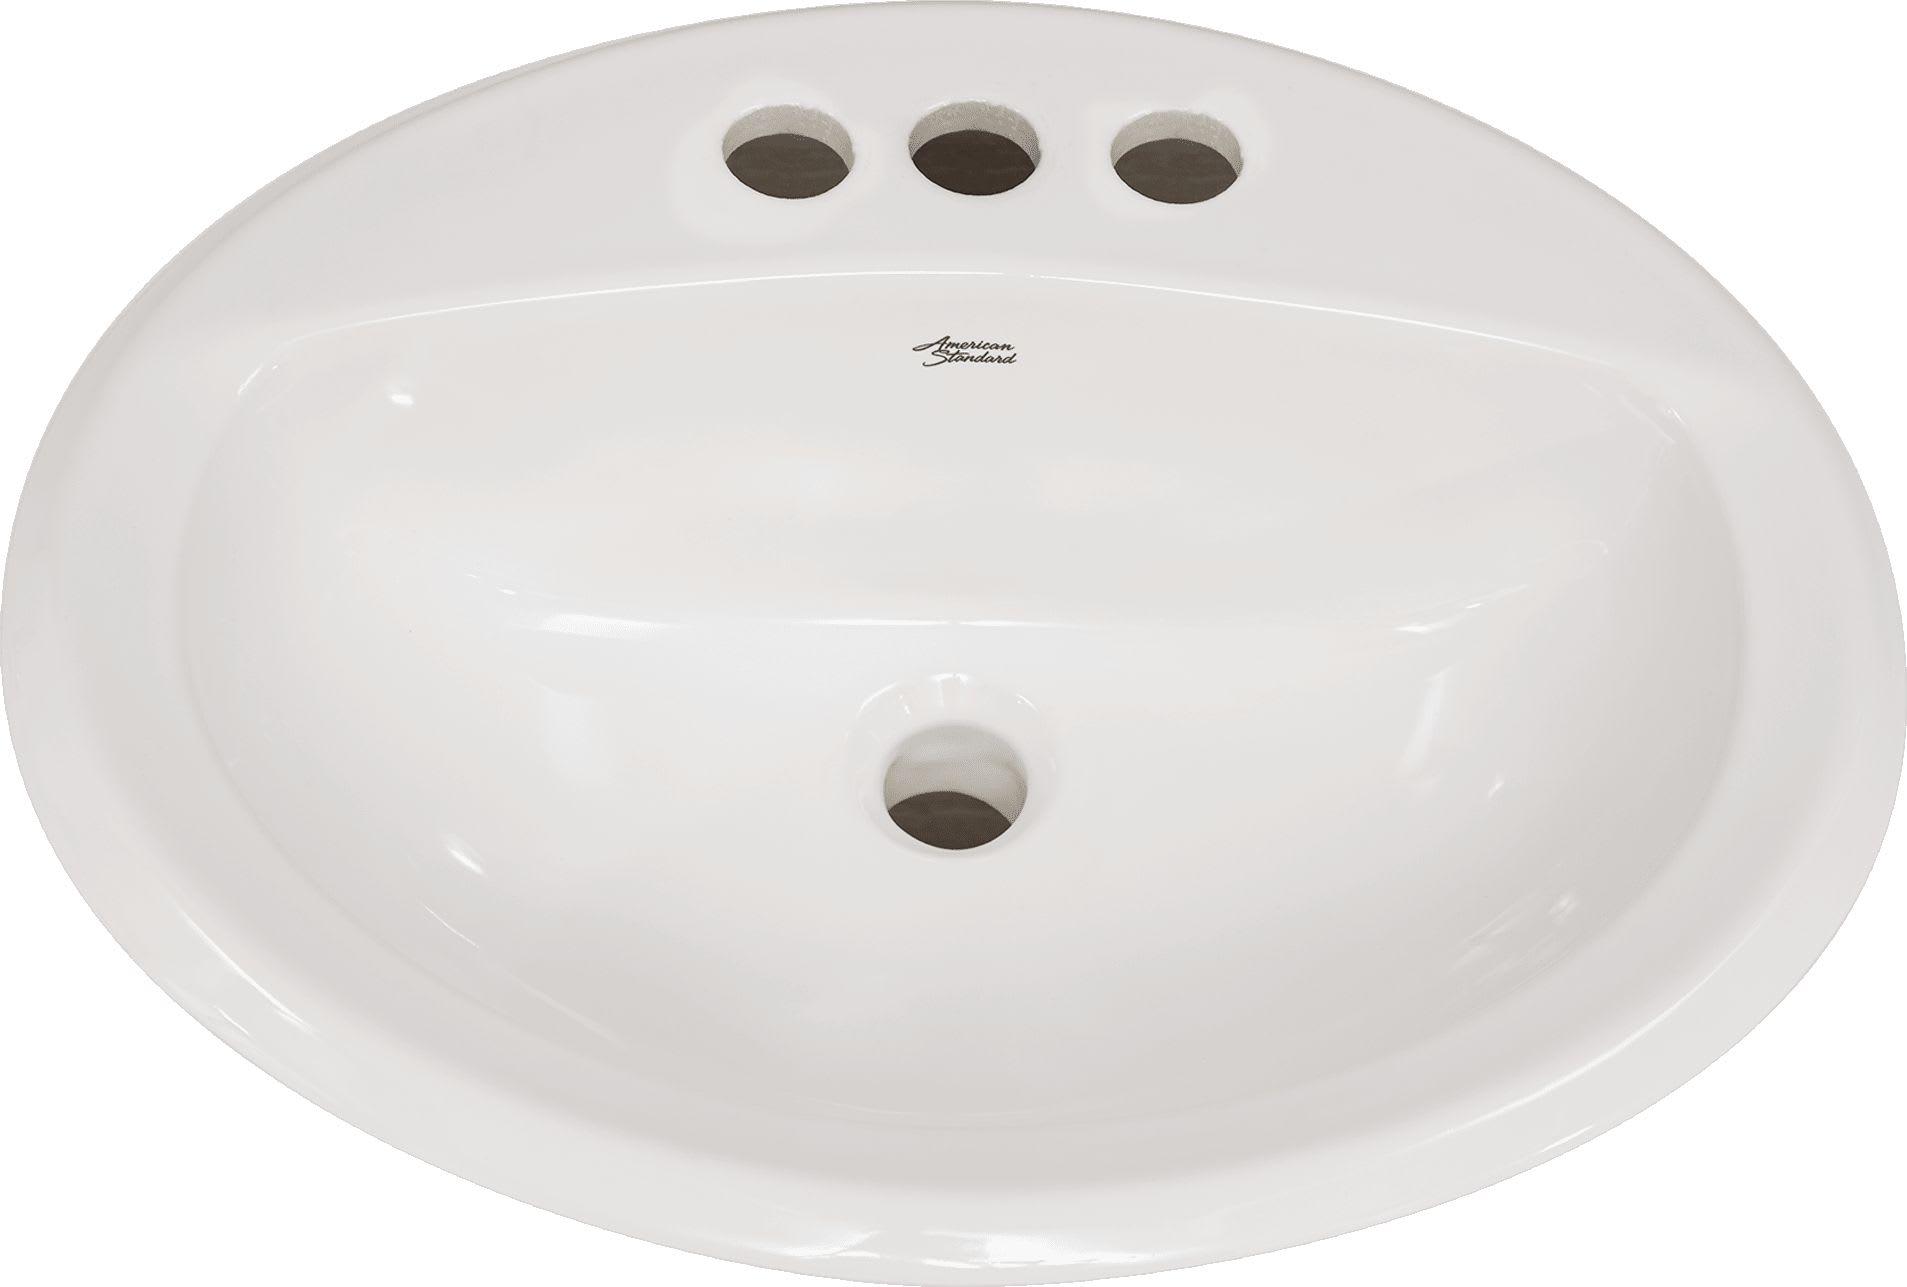 American Standard 0475.020.020 White Aqualyn 20-3/8\